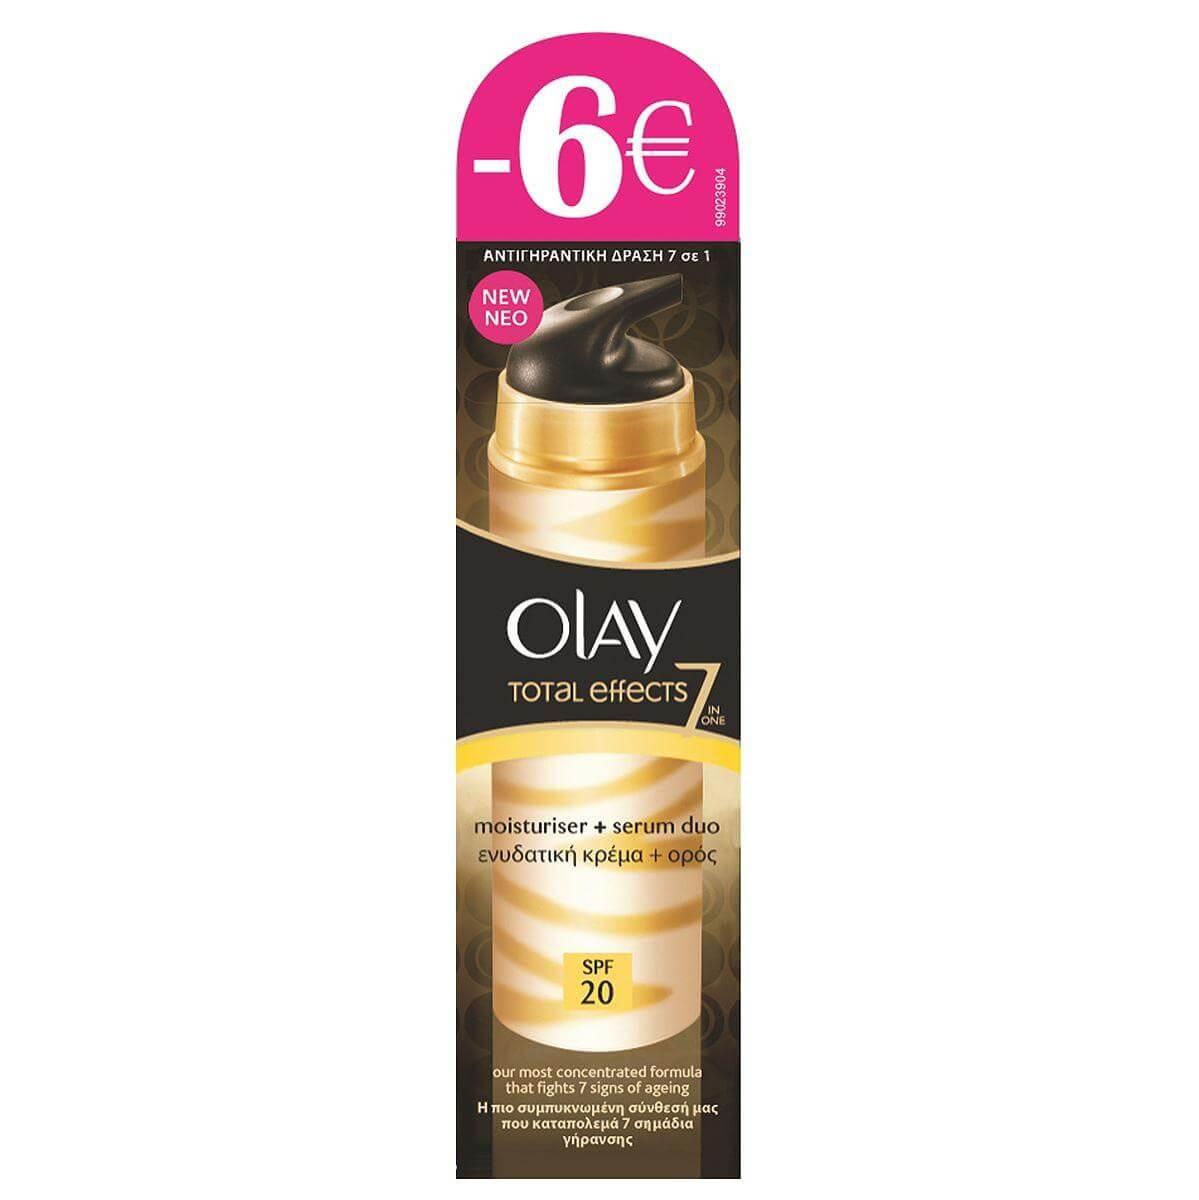 Olay Total Effects 7 in1 Moisturiser & Serum Spf 20 Ενυδατική Κρέμα και Ορός 40ml